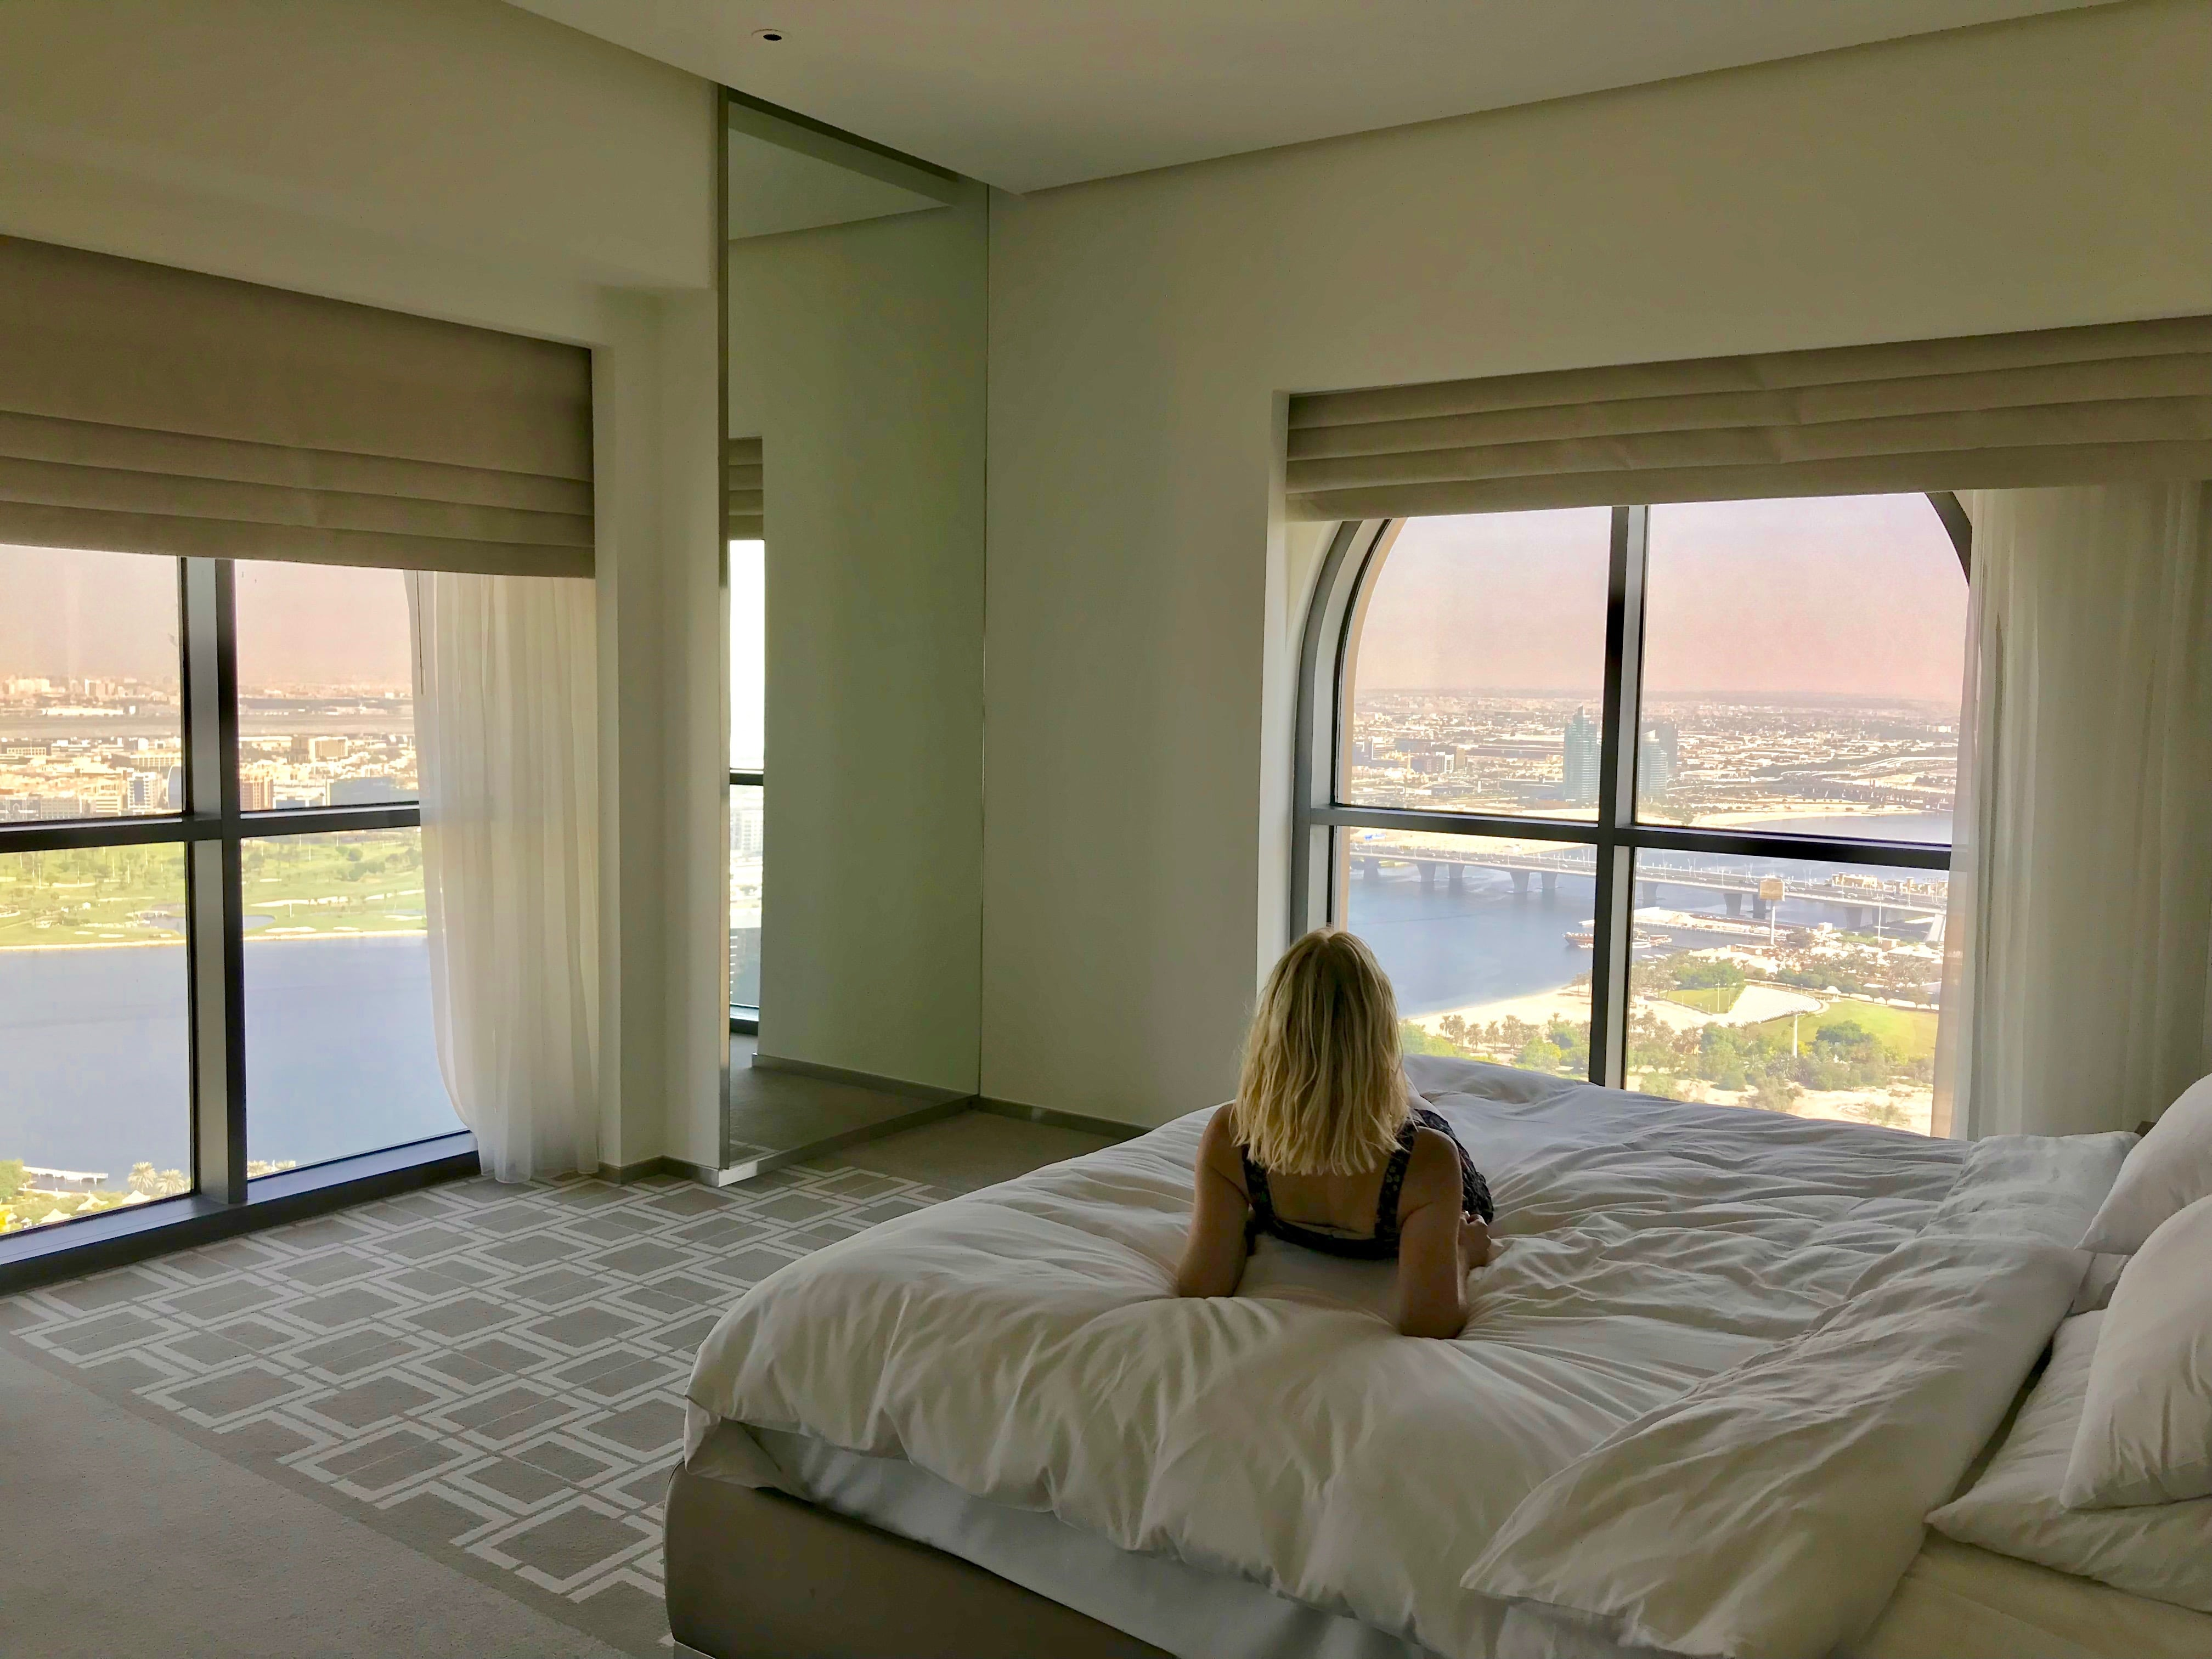 Hyatt Regency Dubai Creek Heights (Review)